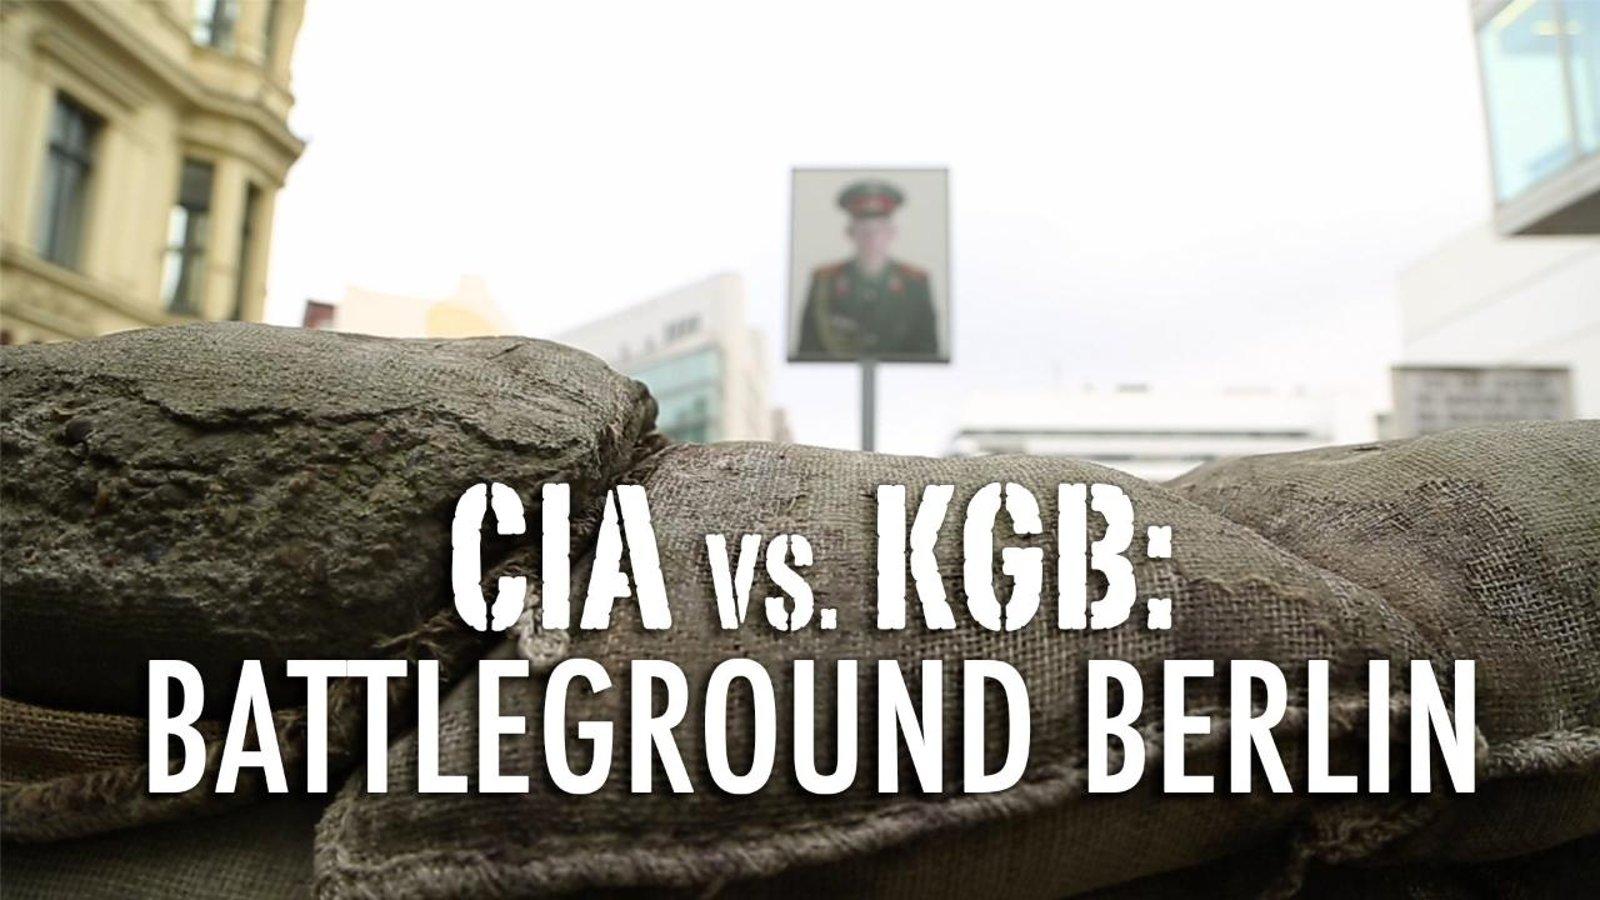 CIA vs KGB: Battleground Berlin - N.A